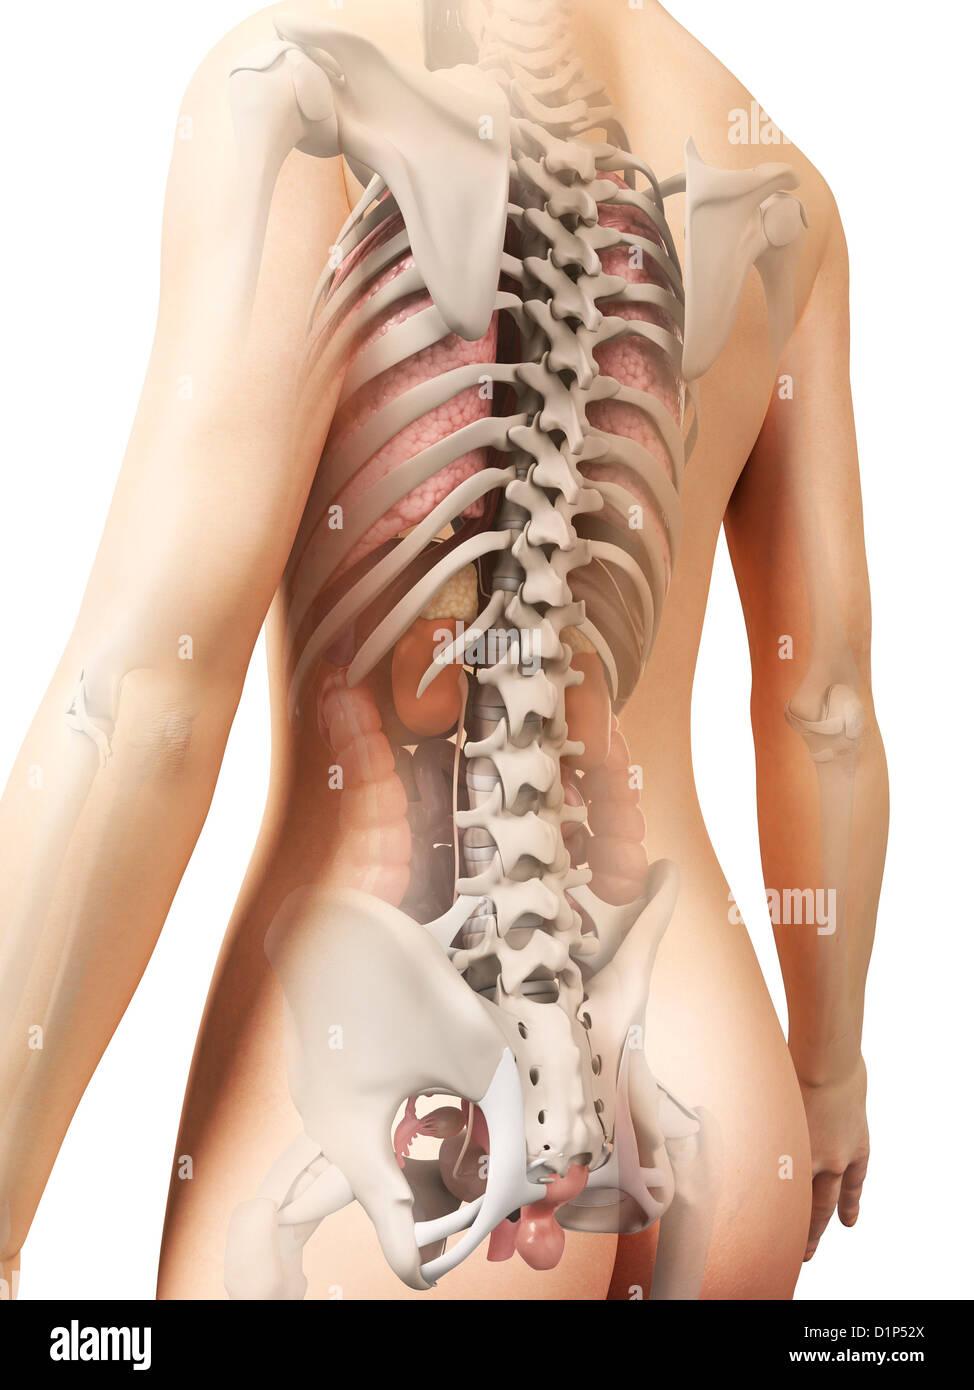 Anatomy Female Pelvis Stockfotos Anatomy Female Pelvis Bilder Alamy